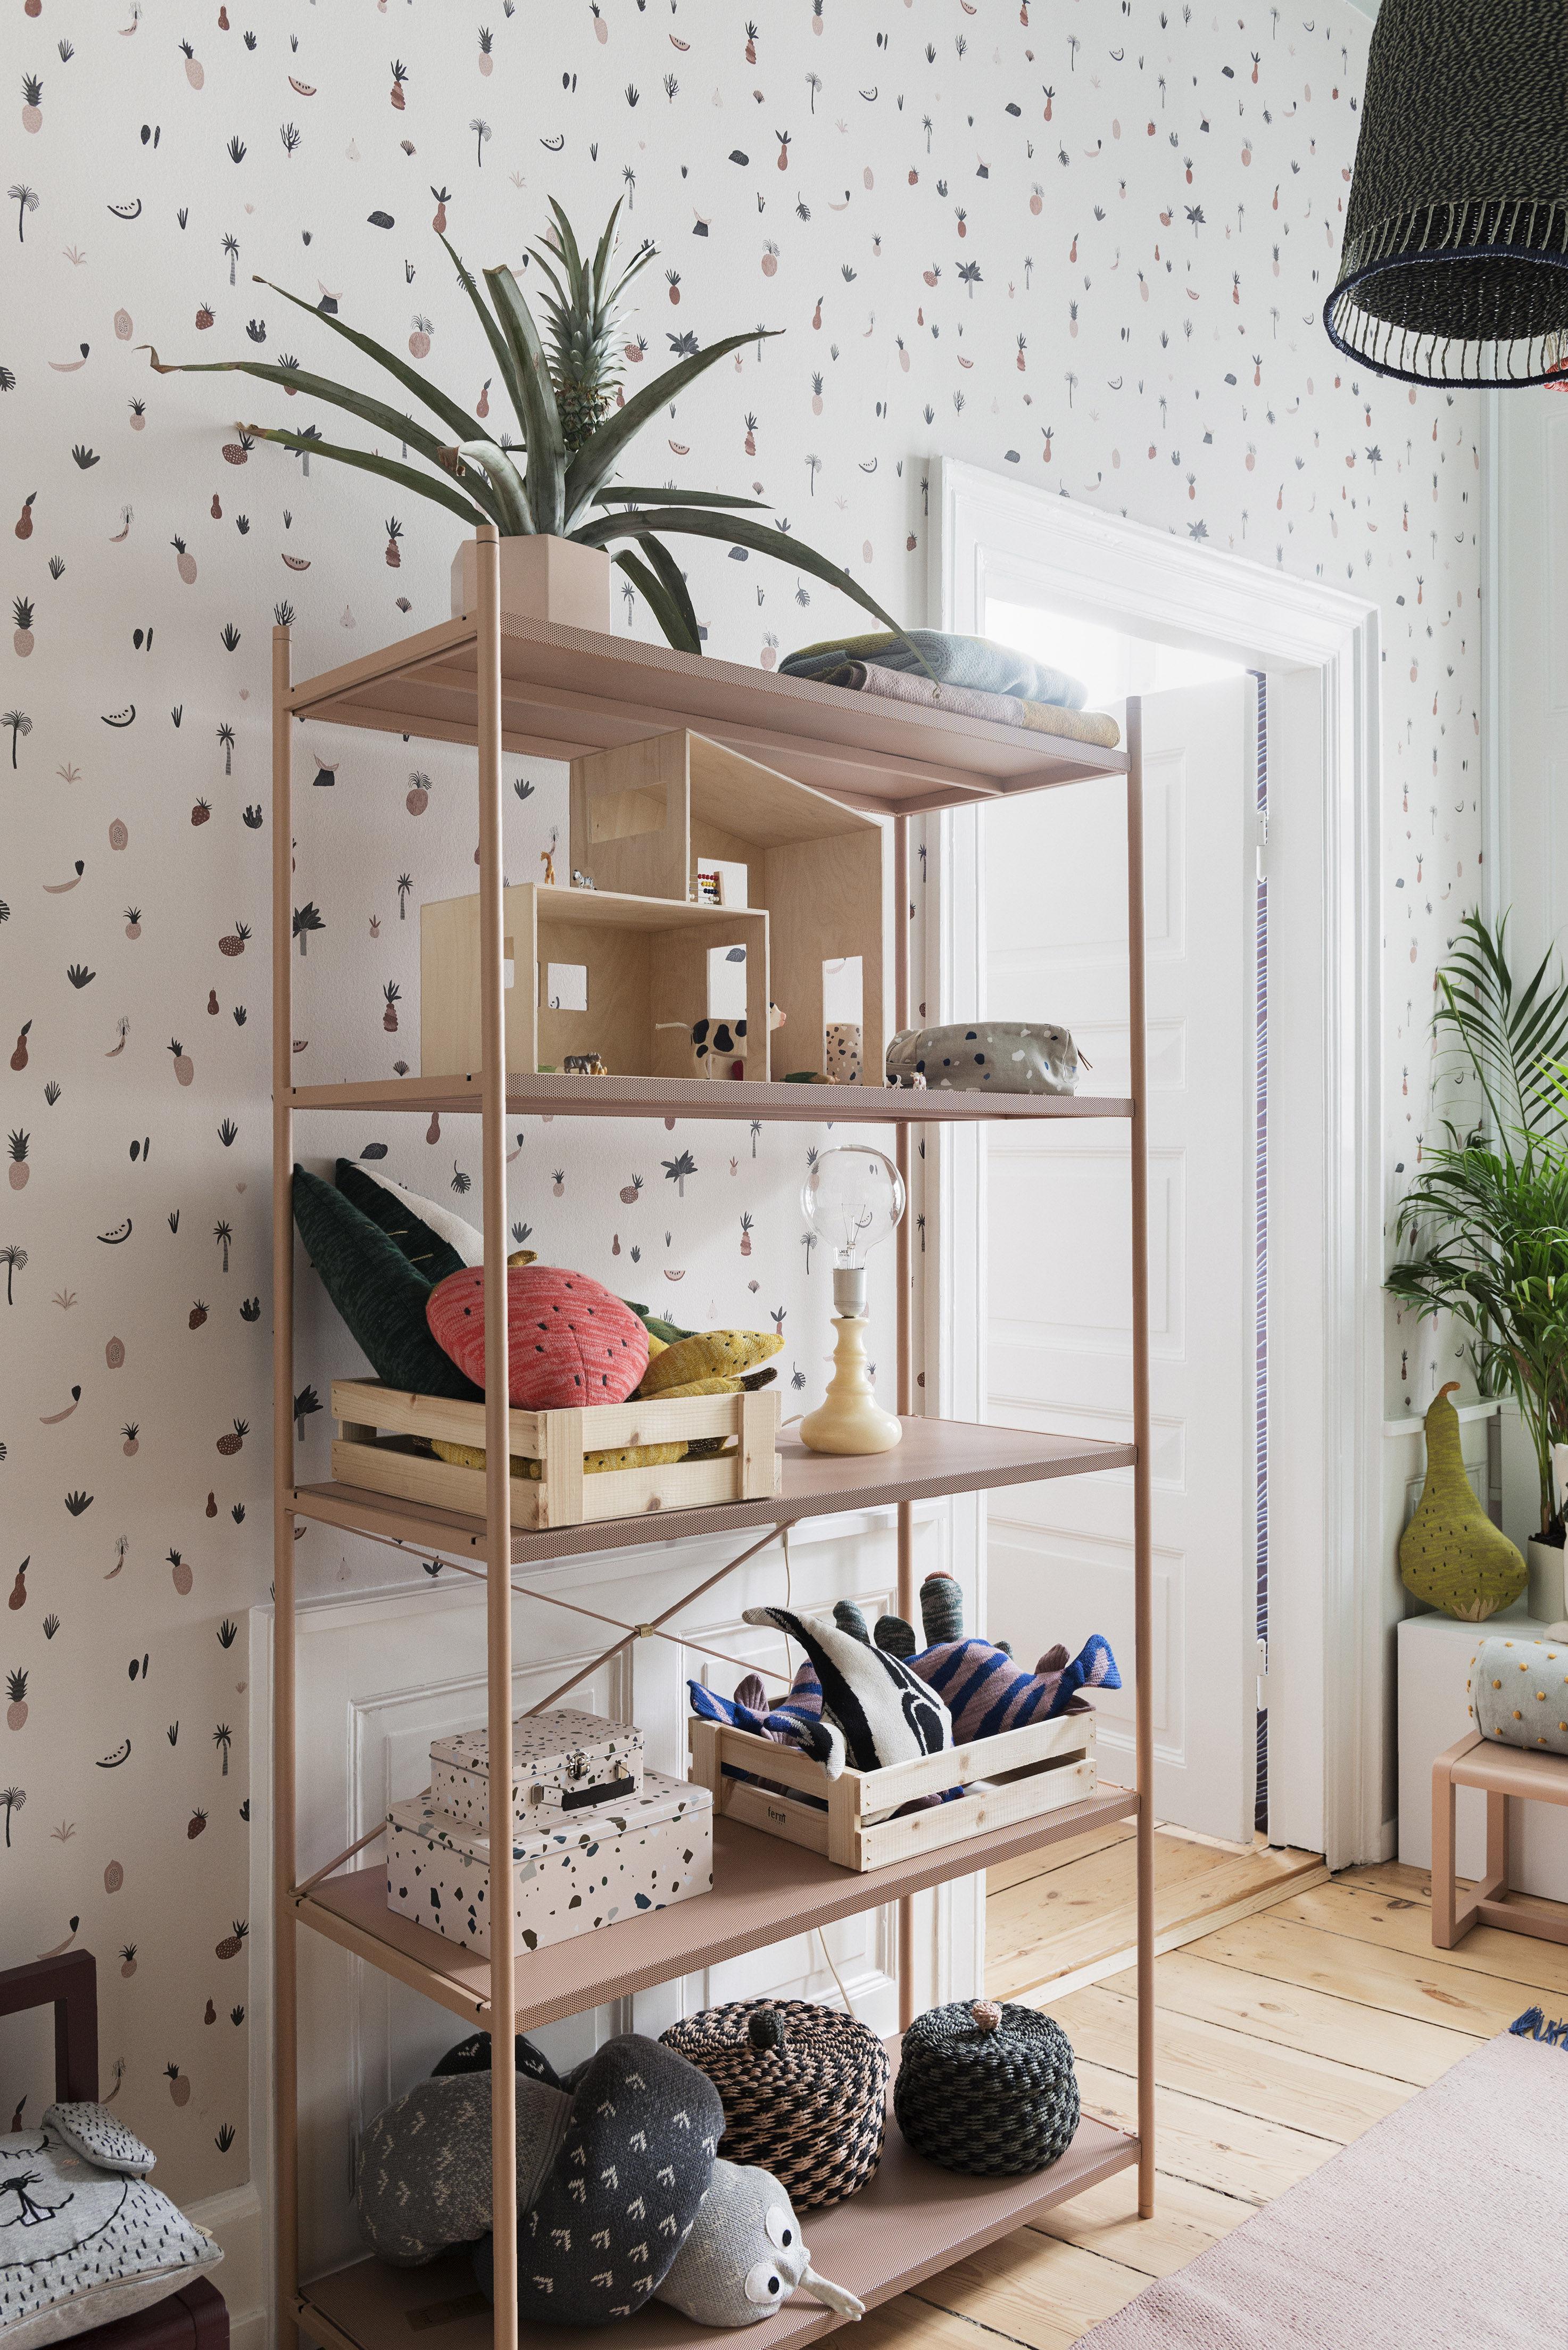 funkis small puppenhaus l 47 cm x h 36 cm ferm living regal. Black Bedroom Furniture Sets. Home Design Ideas